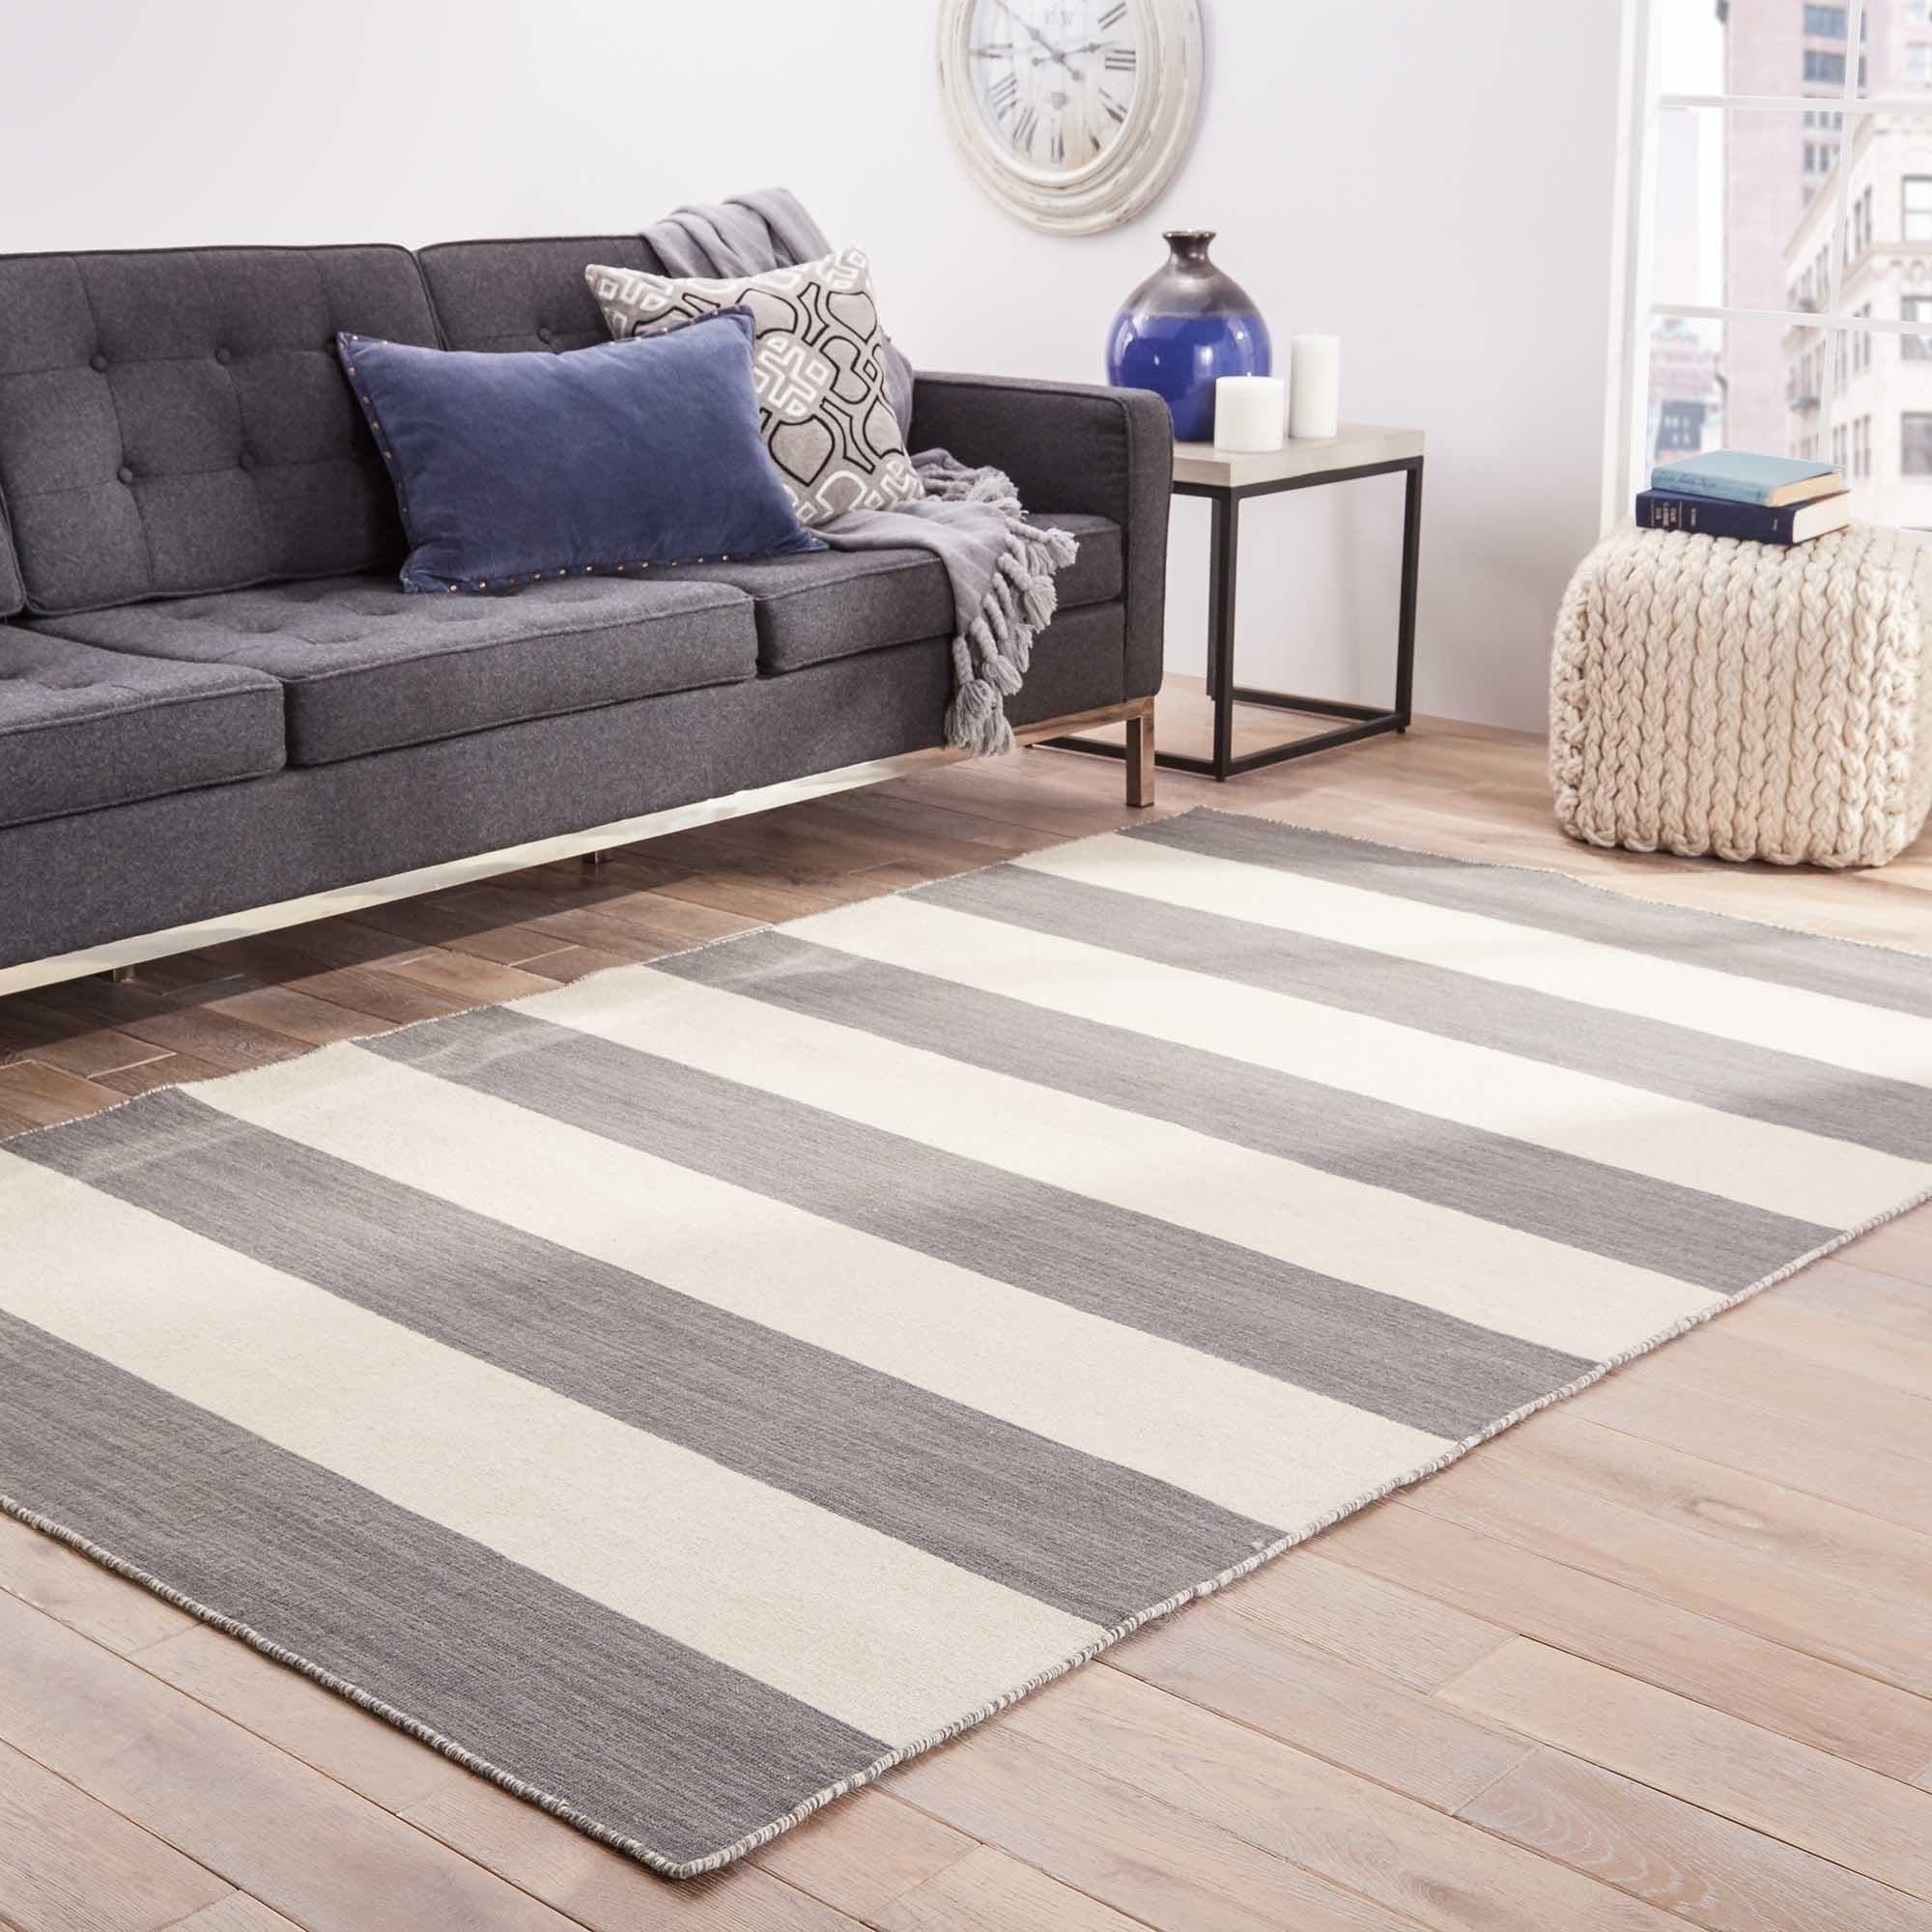 JRCPL Handmade Flat Weave Stripe Pattern Gray/ Black Rug (4' x 6') at Sears.com